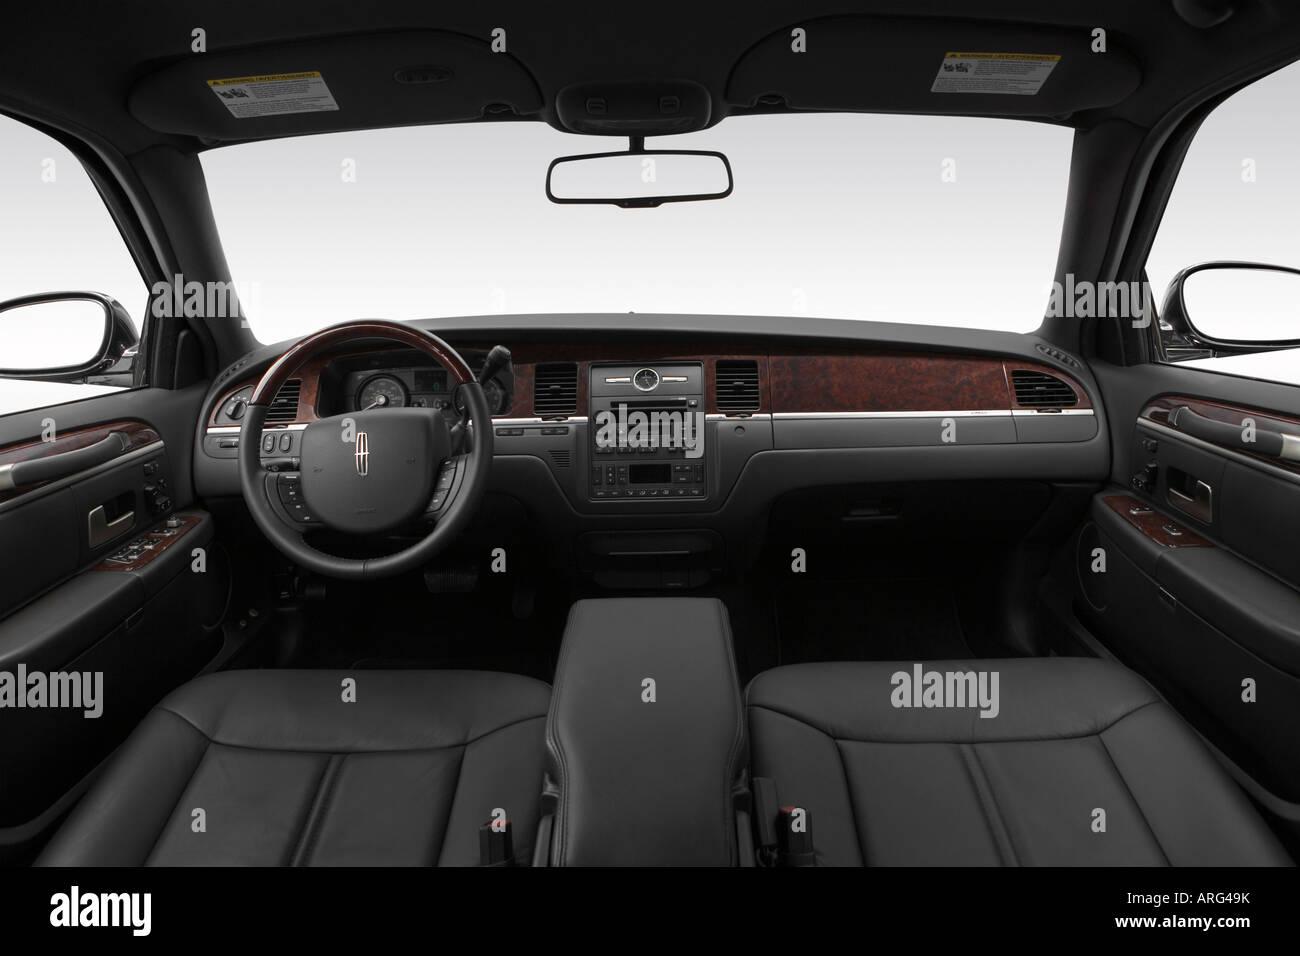 2007 lincoln town car signature l in black dashboard center console gear shifter